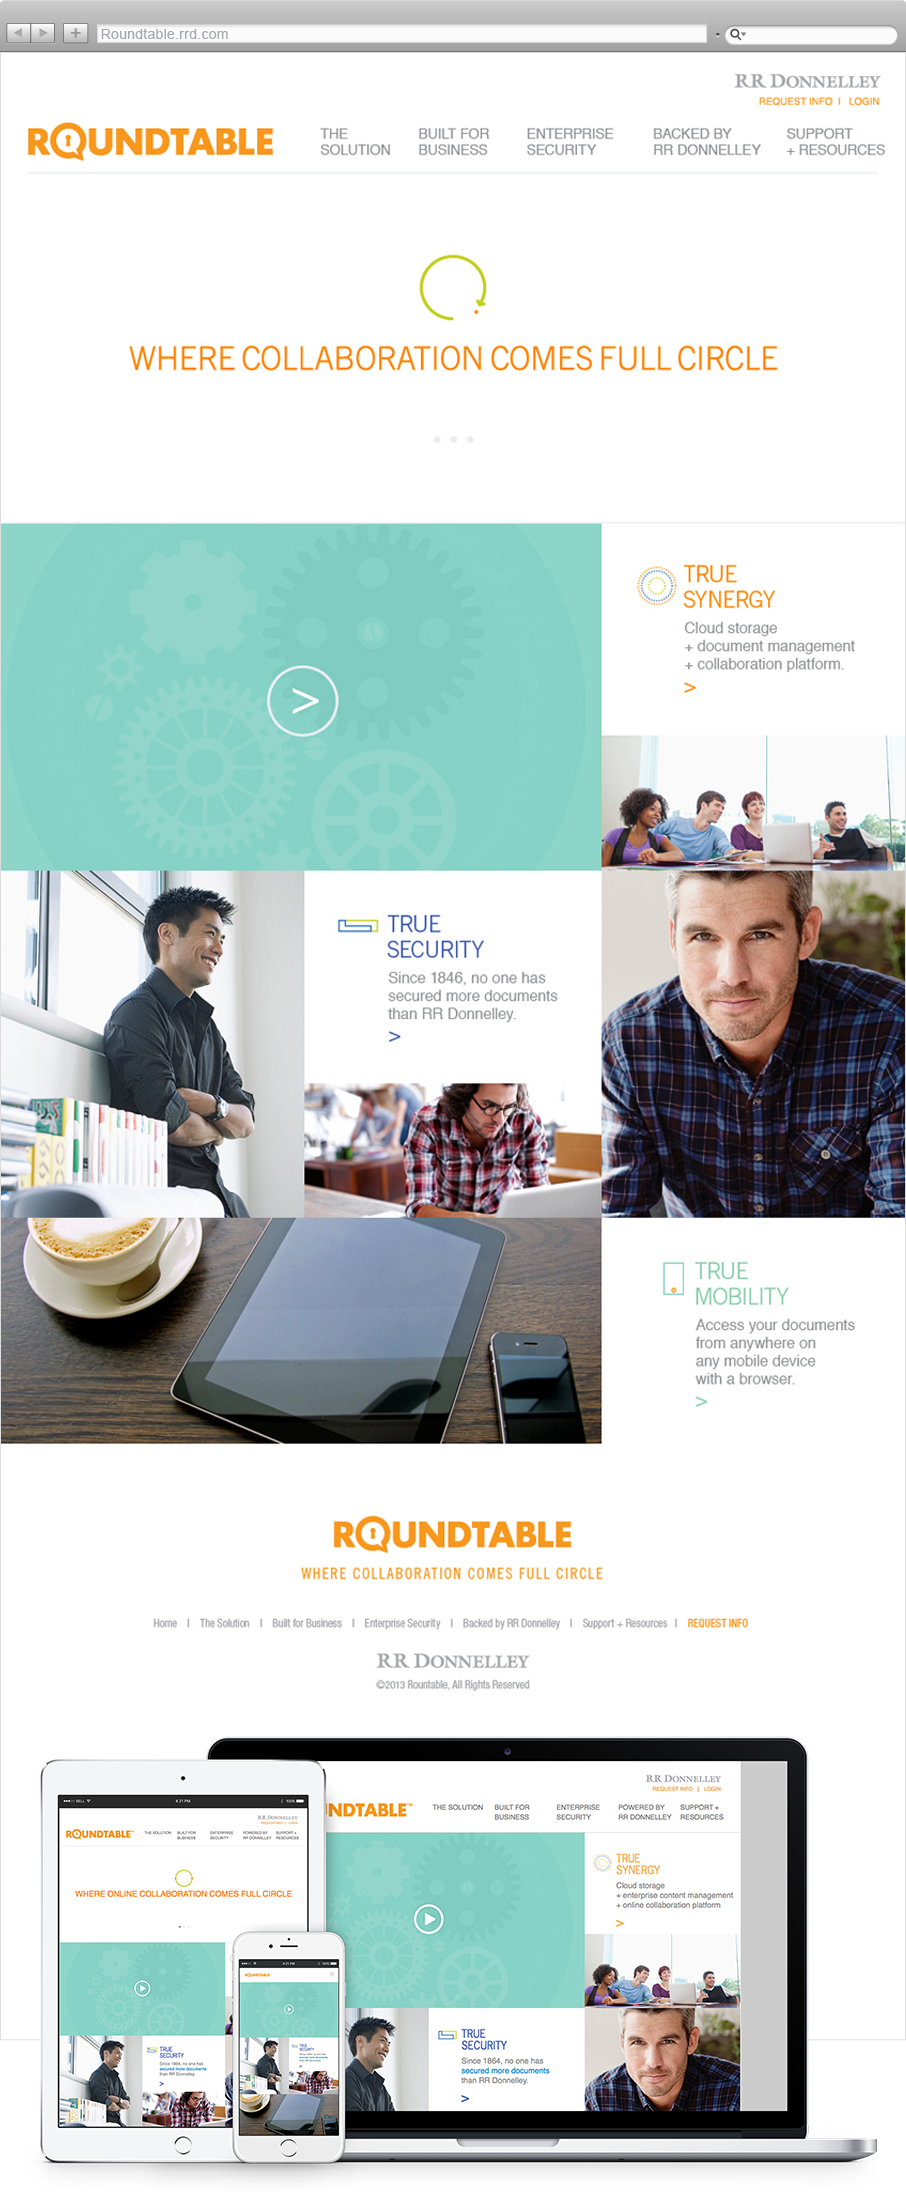 Roundtable_webcomp_14_1000update.jpg